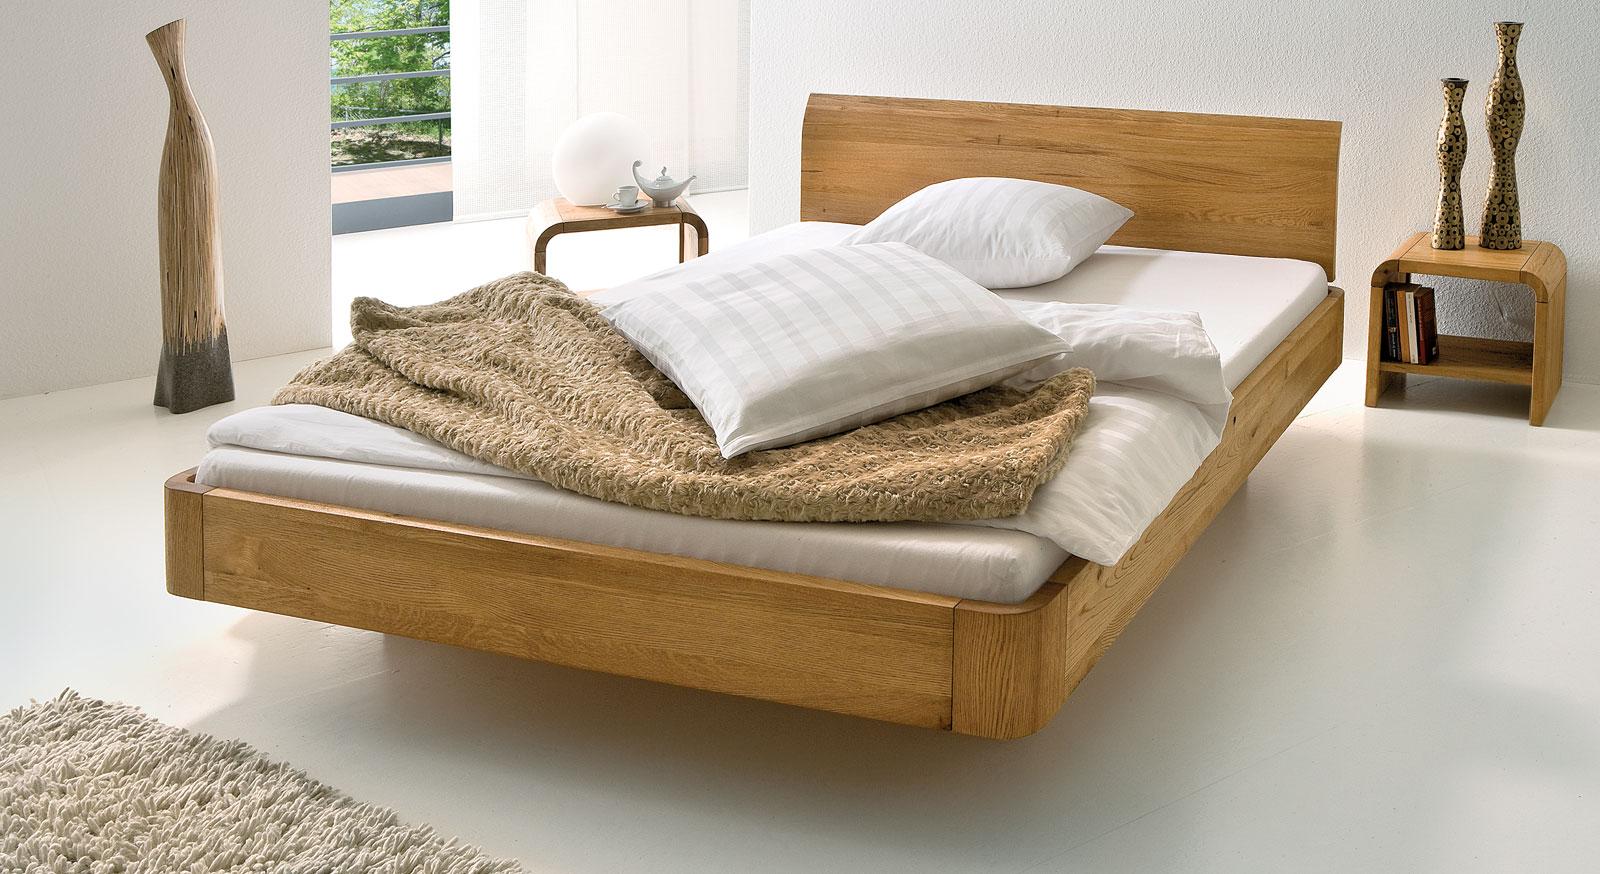 Full Size of Kalte Betten Definition Ikea Deutschland Gutscheincode Aus Car Dealership Gutschein Matratzen De Erfahrungen Muskegon Mi Design Wunderschnes Massivholzbett Bett Betten De